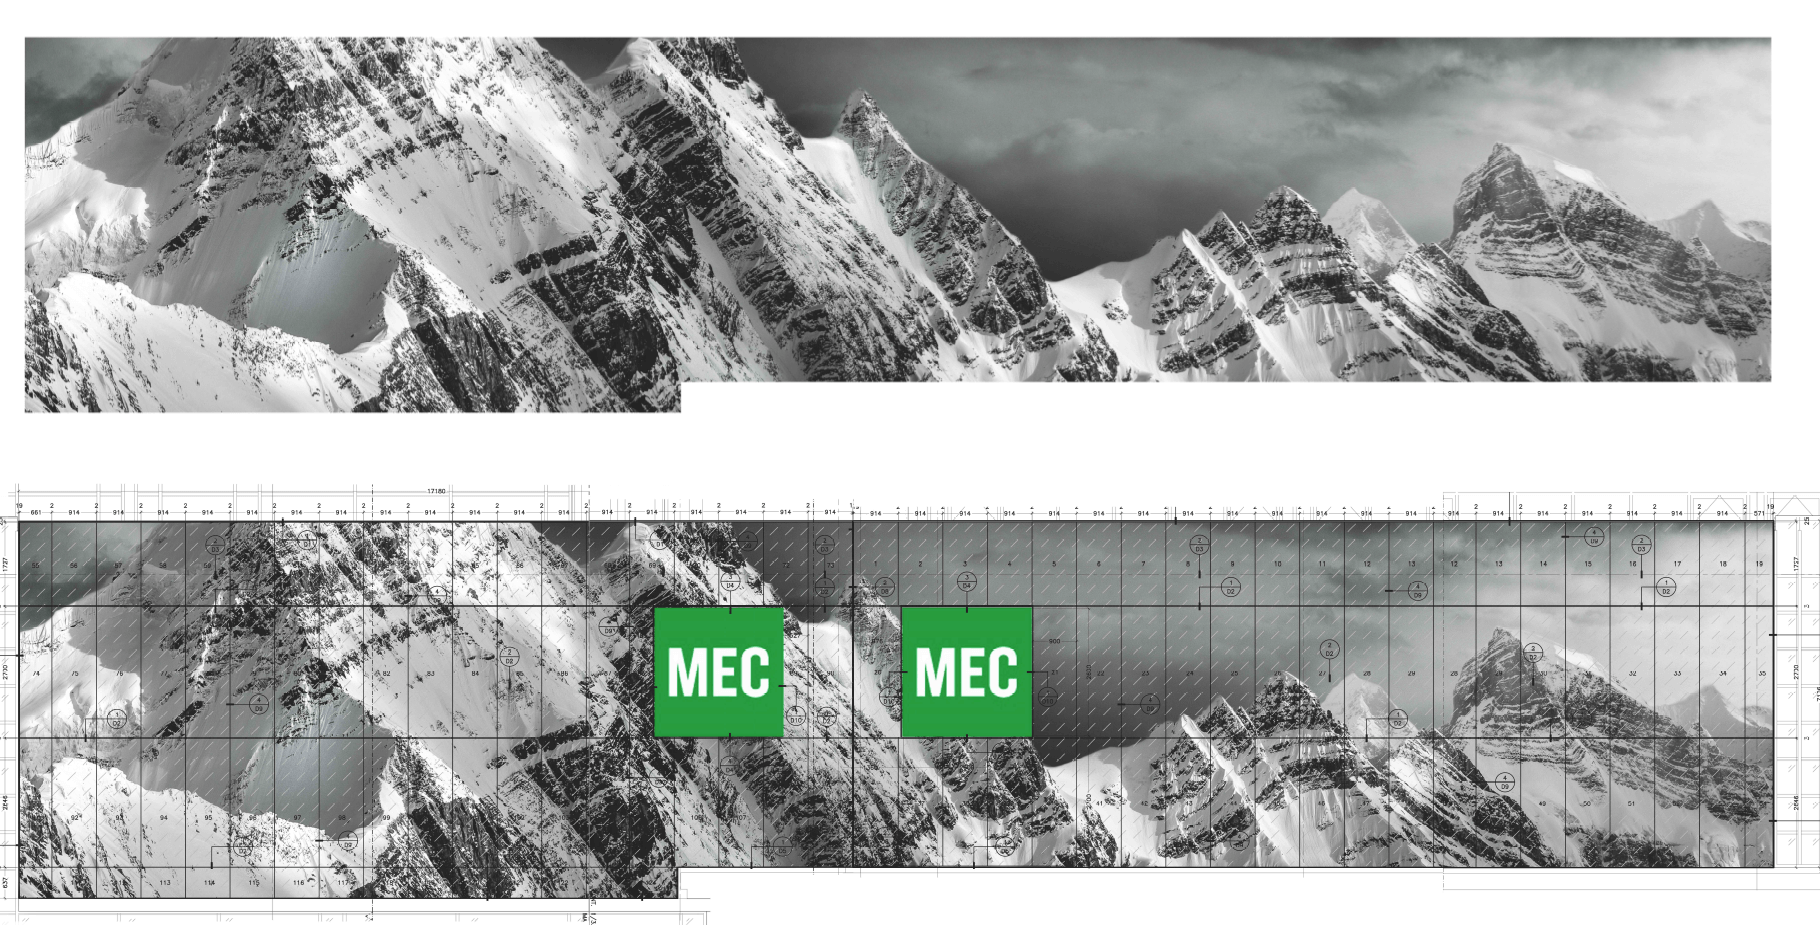 MEC-artwork-crop